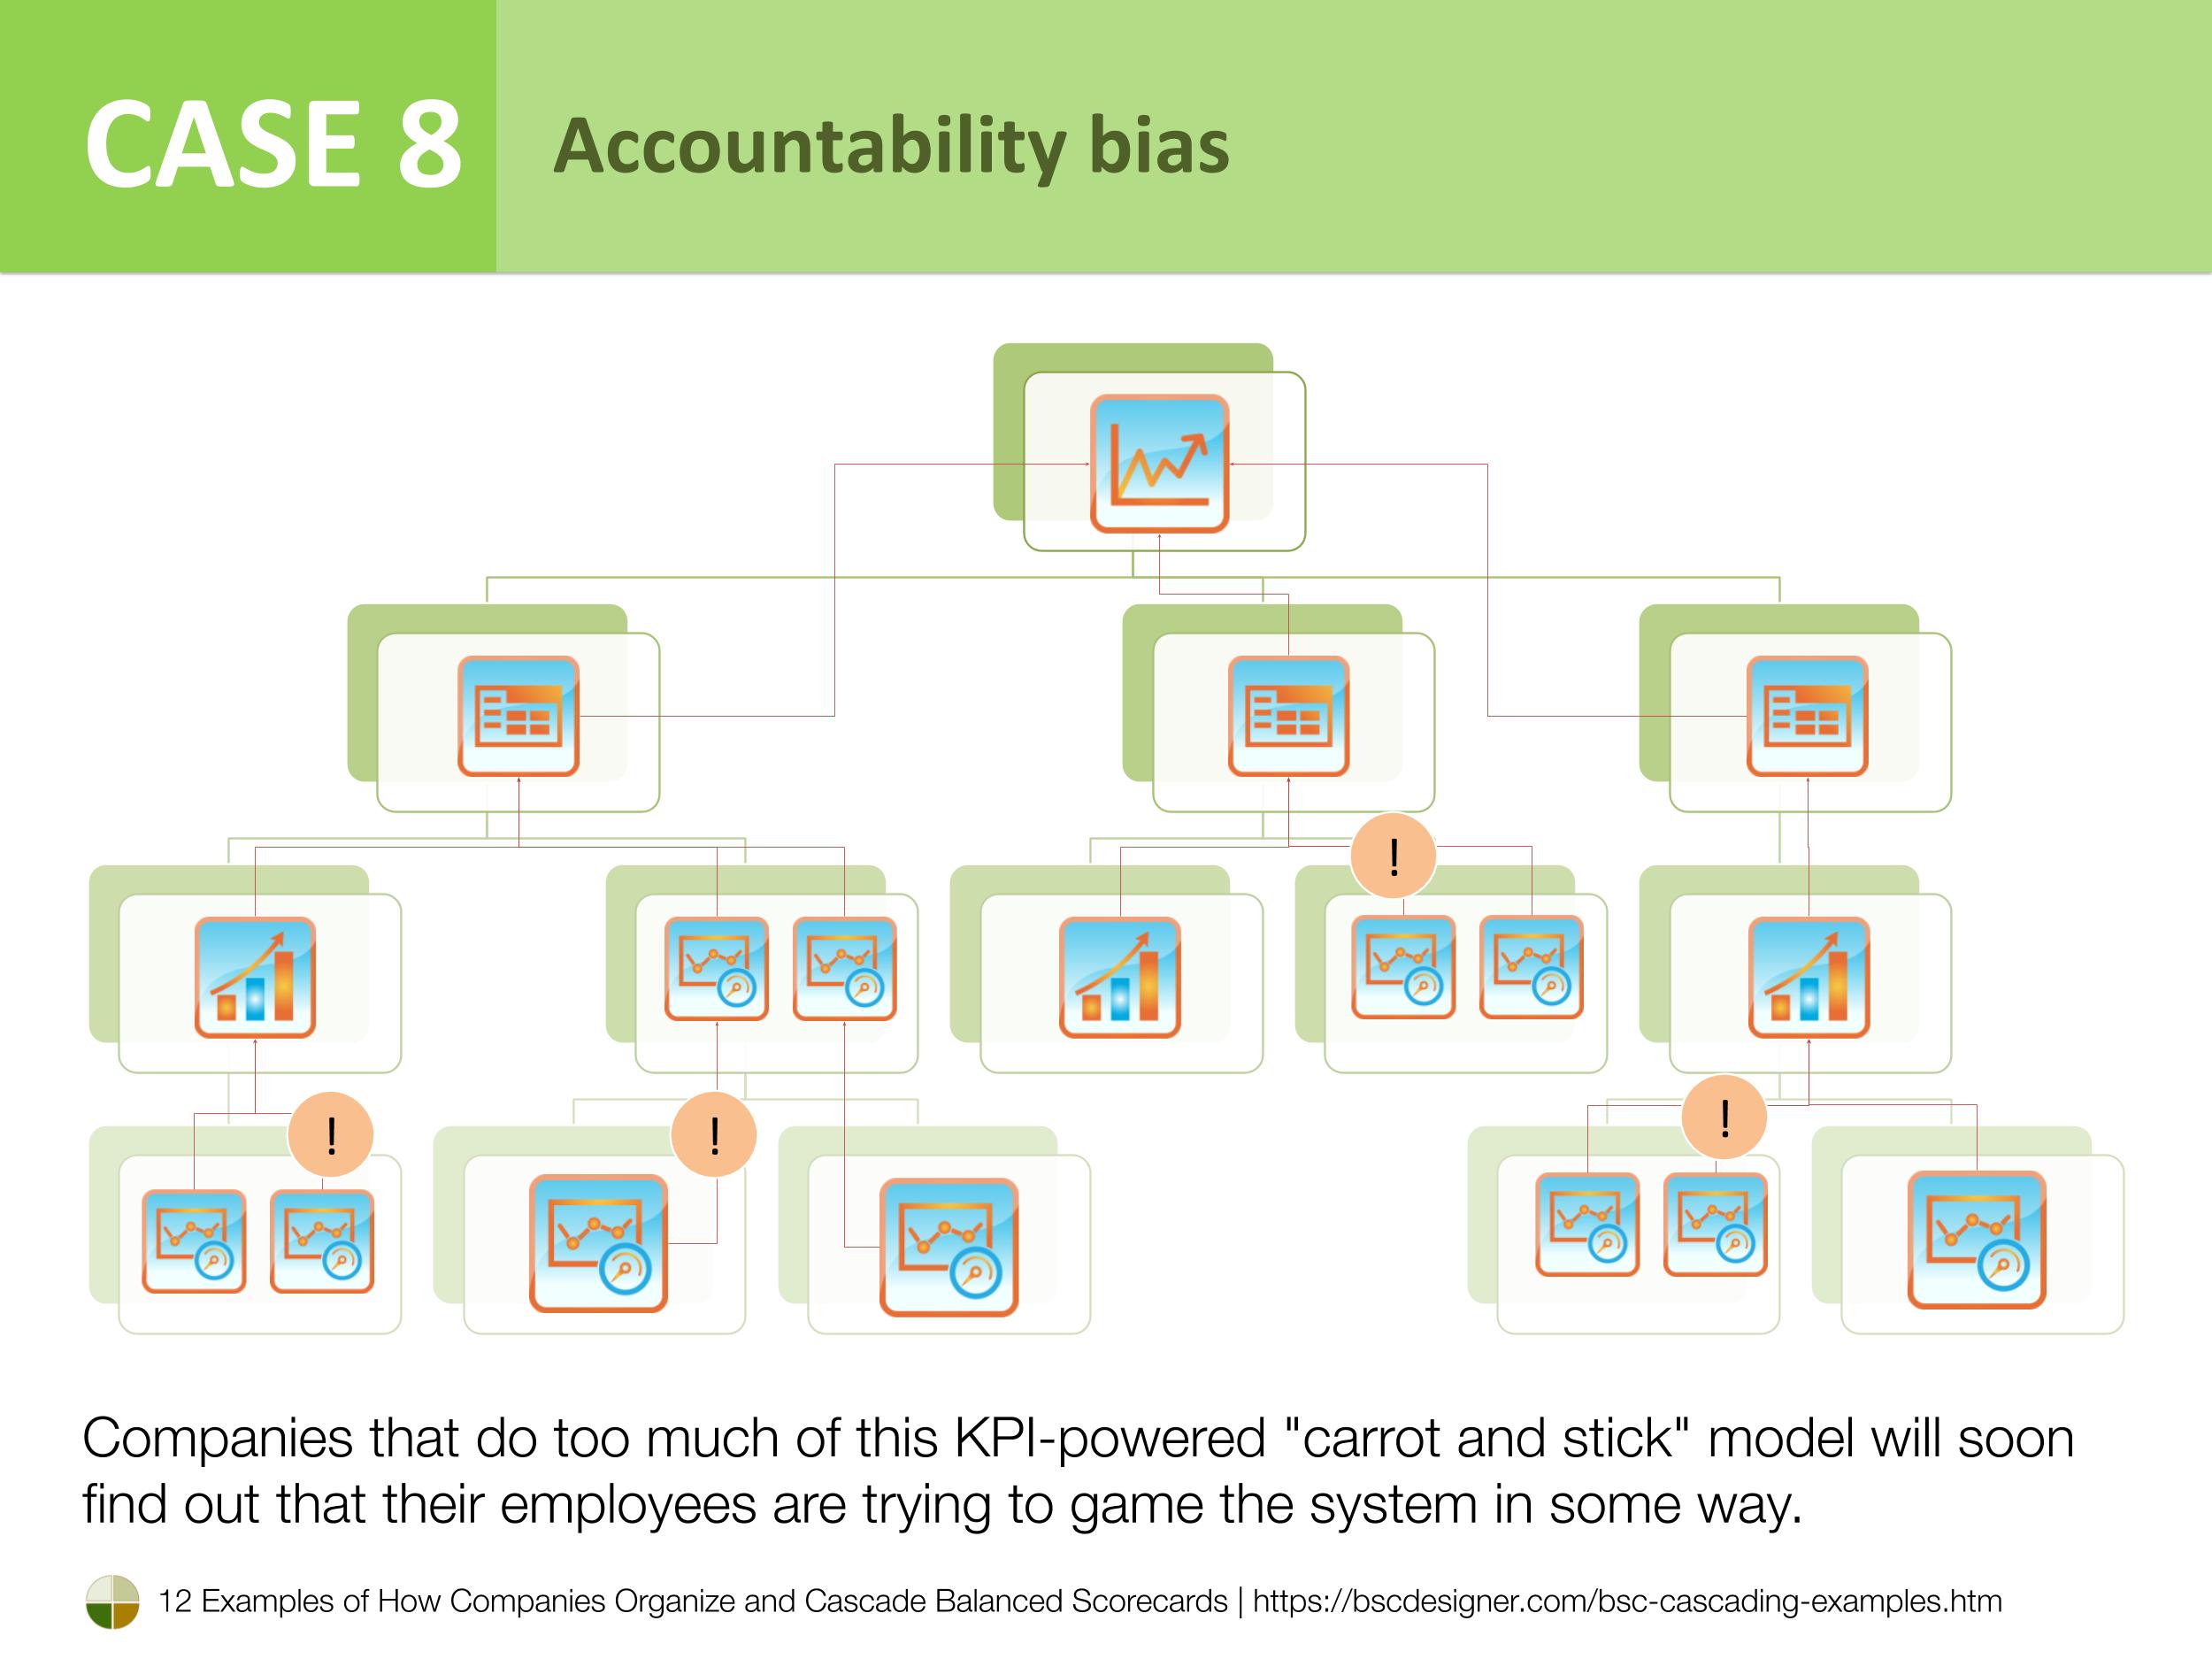 Case 8 - Accountability bias